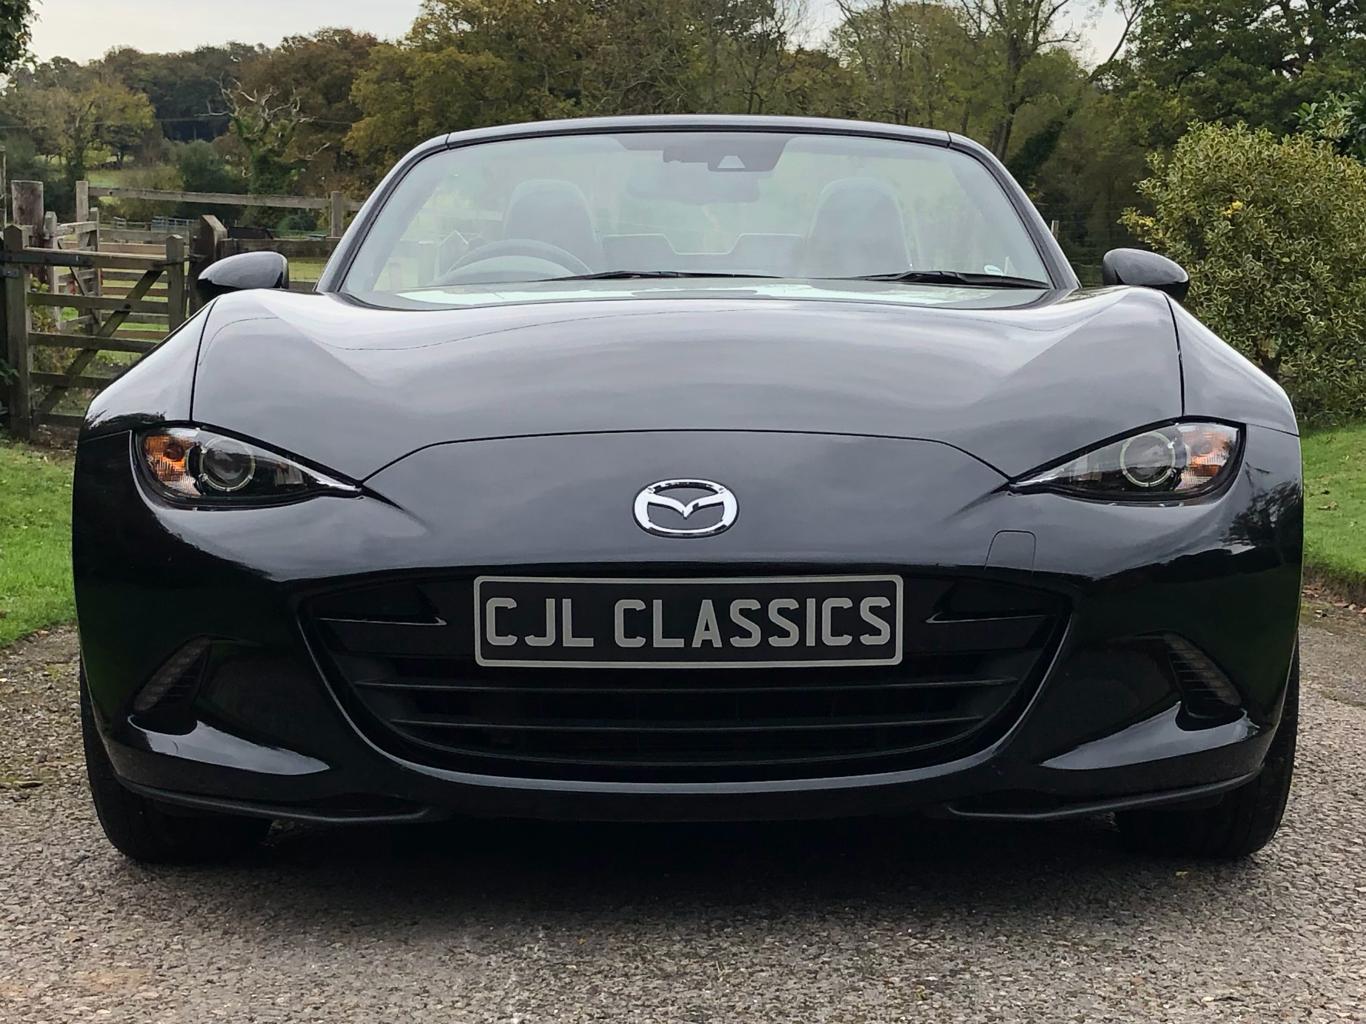 2018 Mazda MX-5 Sport Nav  For Sale (picture 1 of 6)